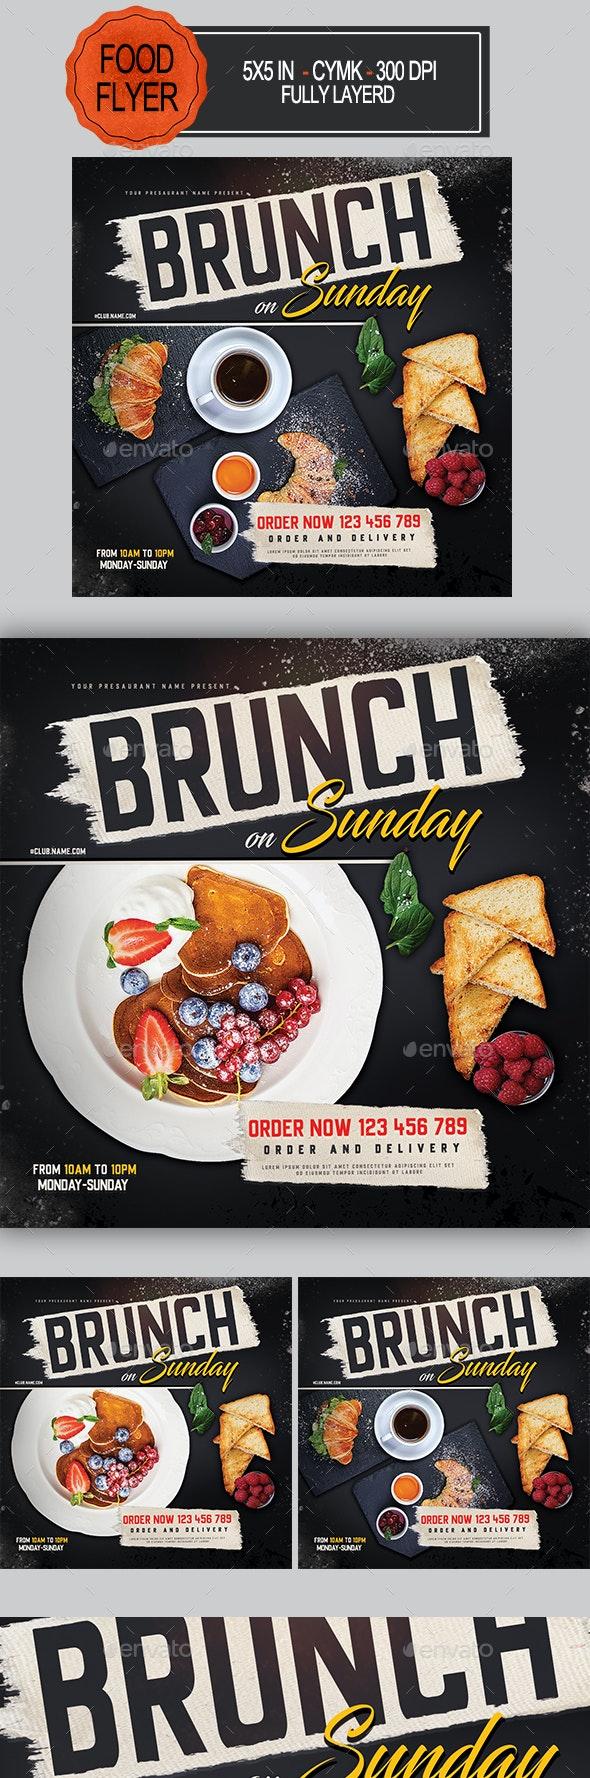 Brunch Flyer - Restaurant Flyers